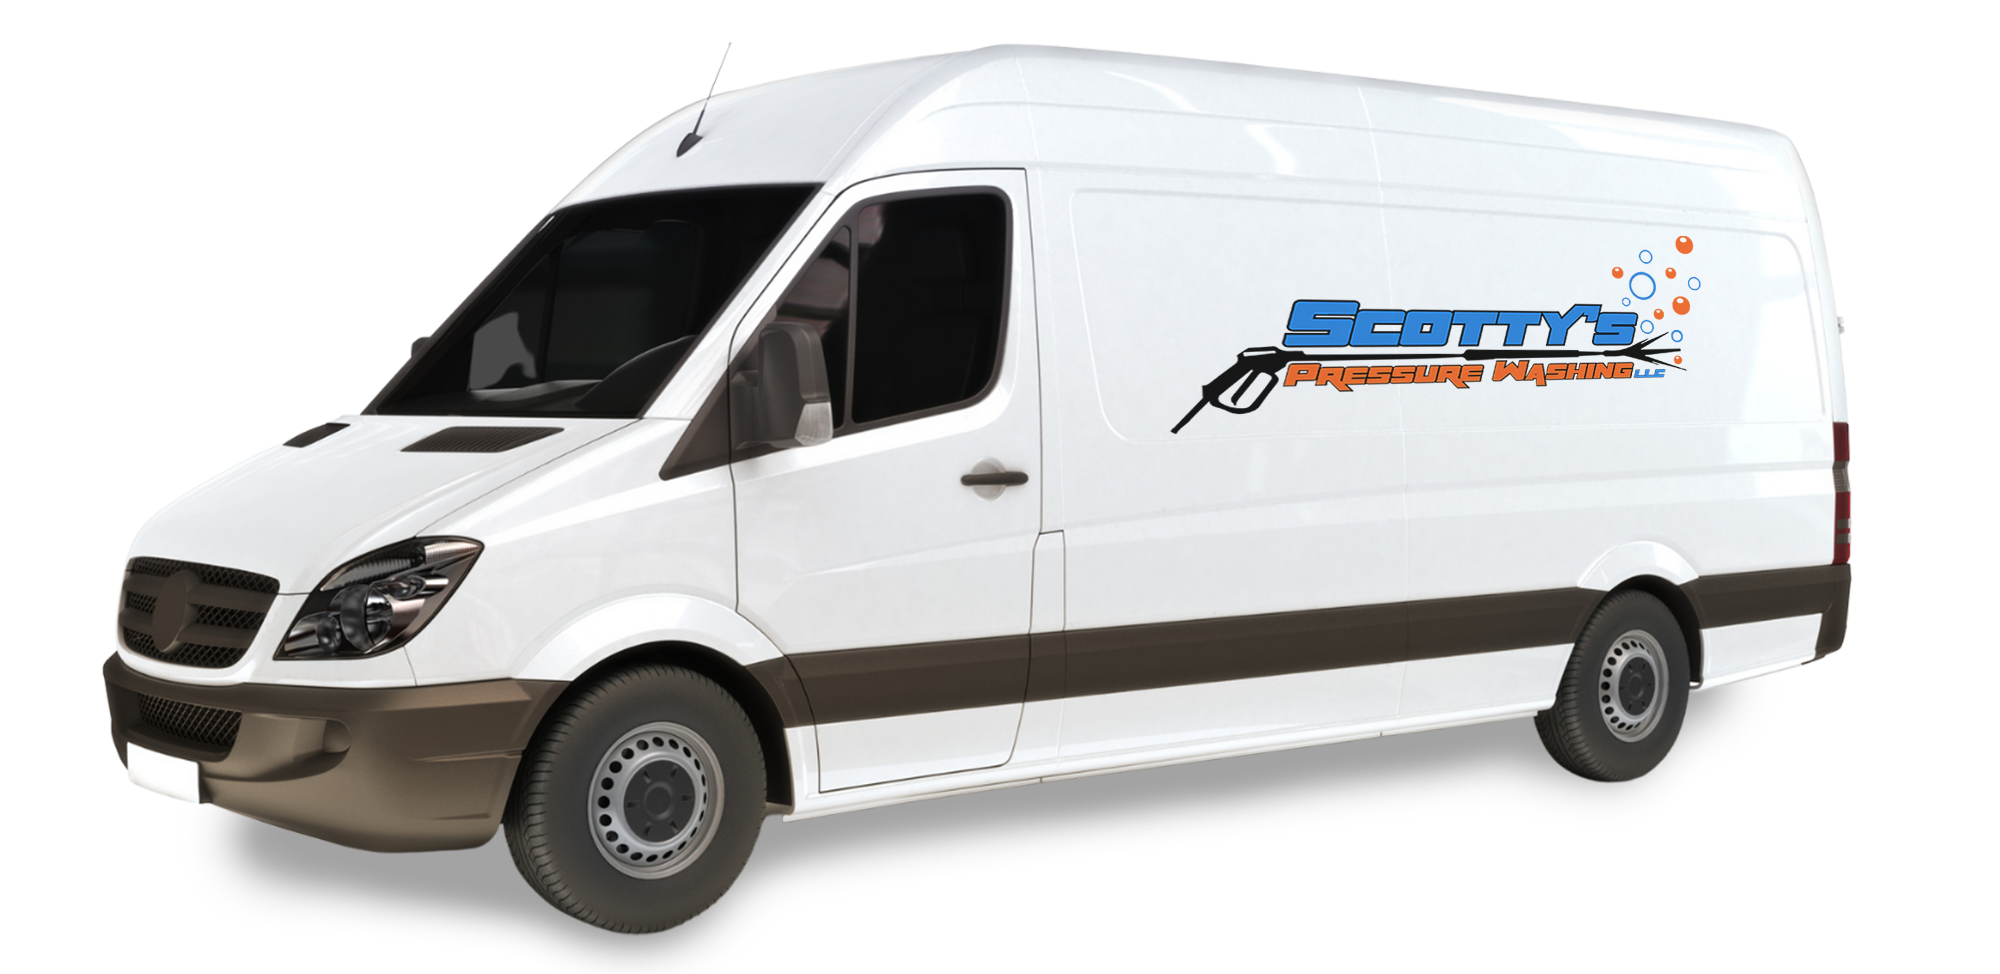 Scottys Pressure Washing LLC Van